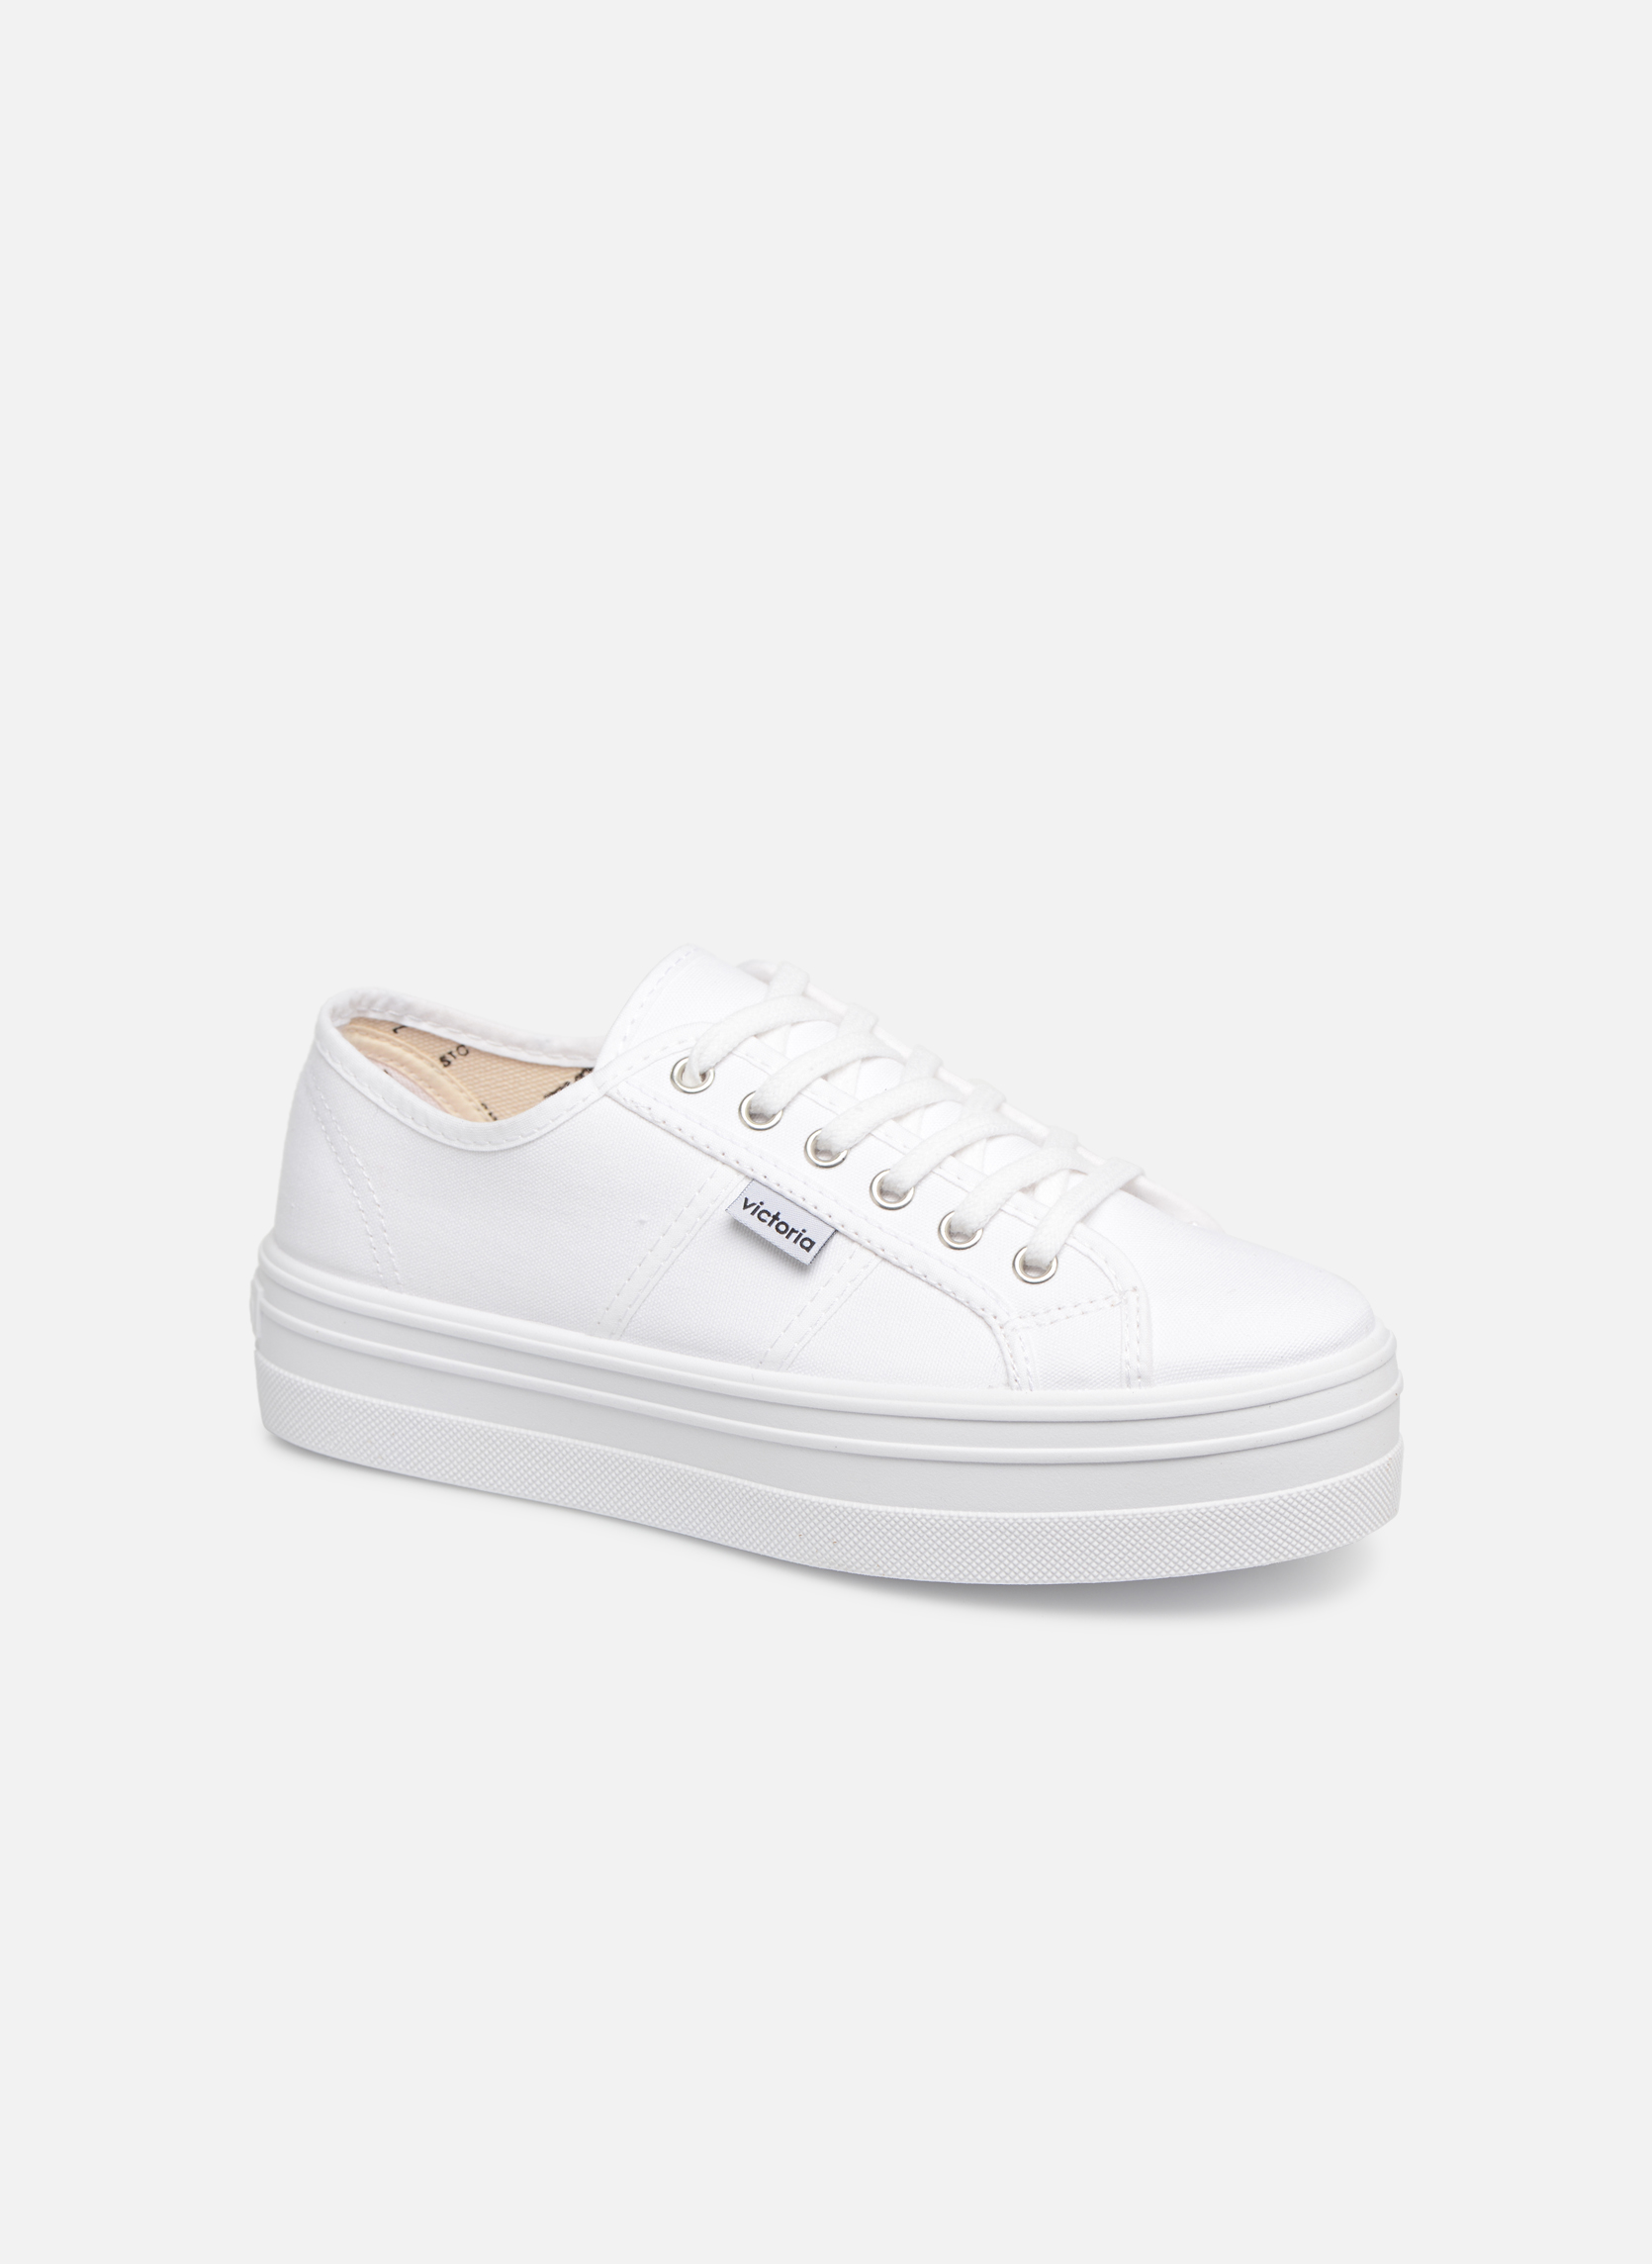 Sneakers Victoria Blucher Lona Plataforma Wit detail